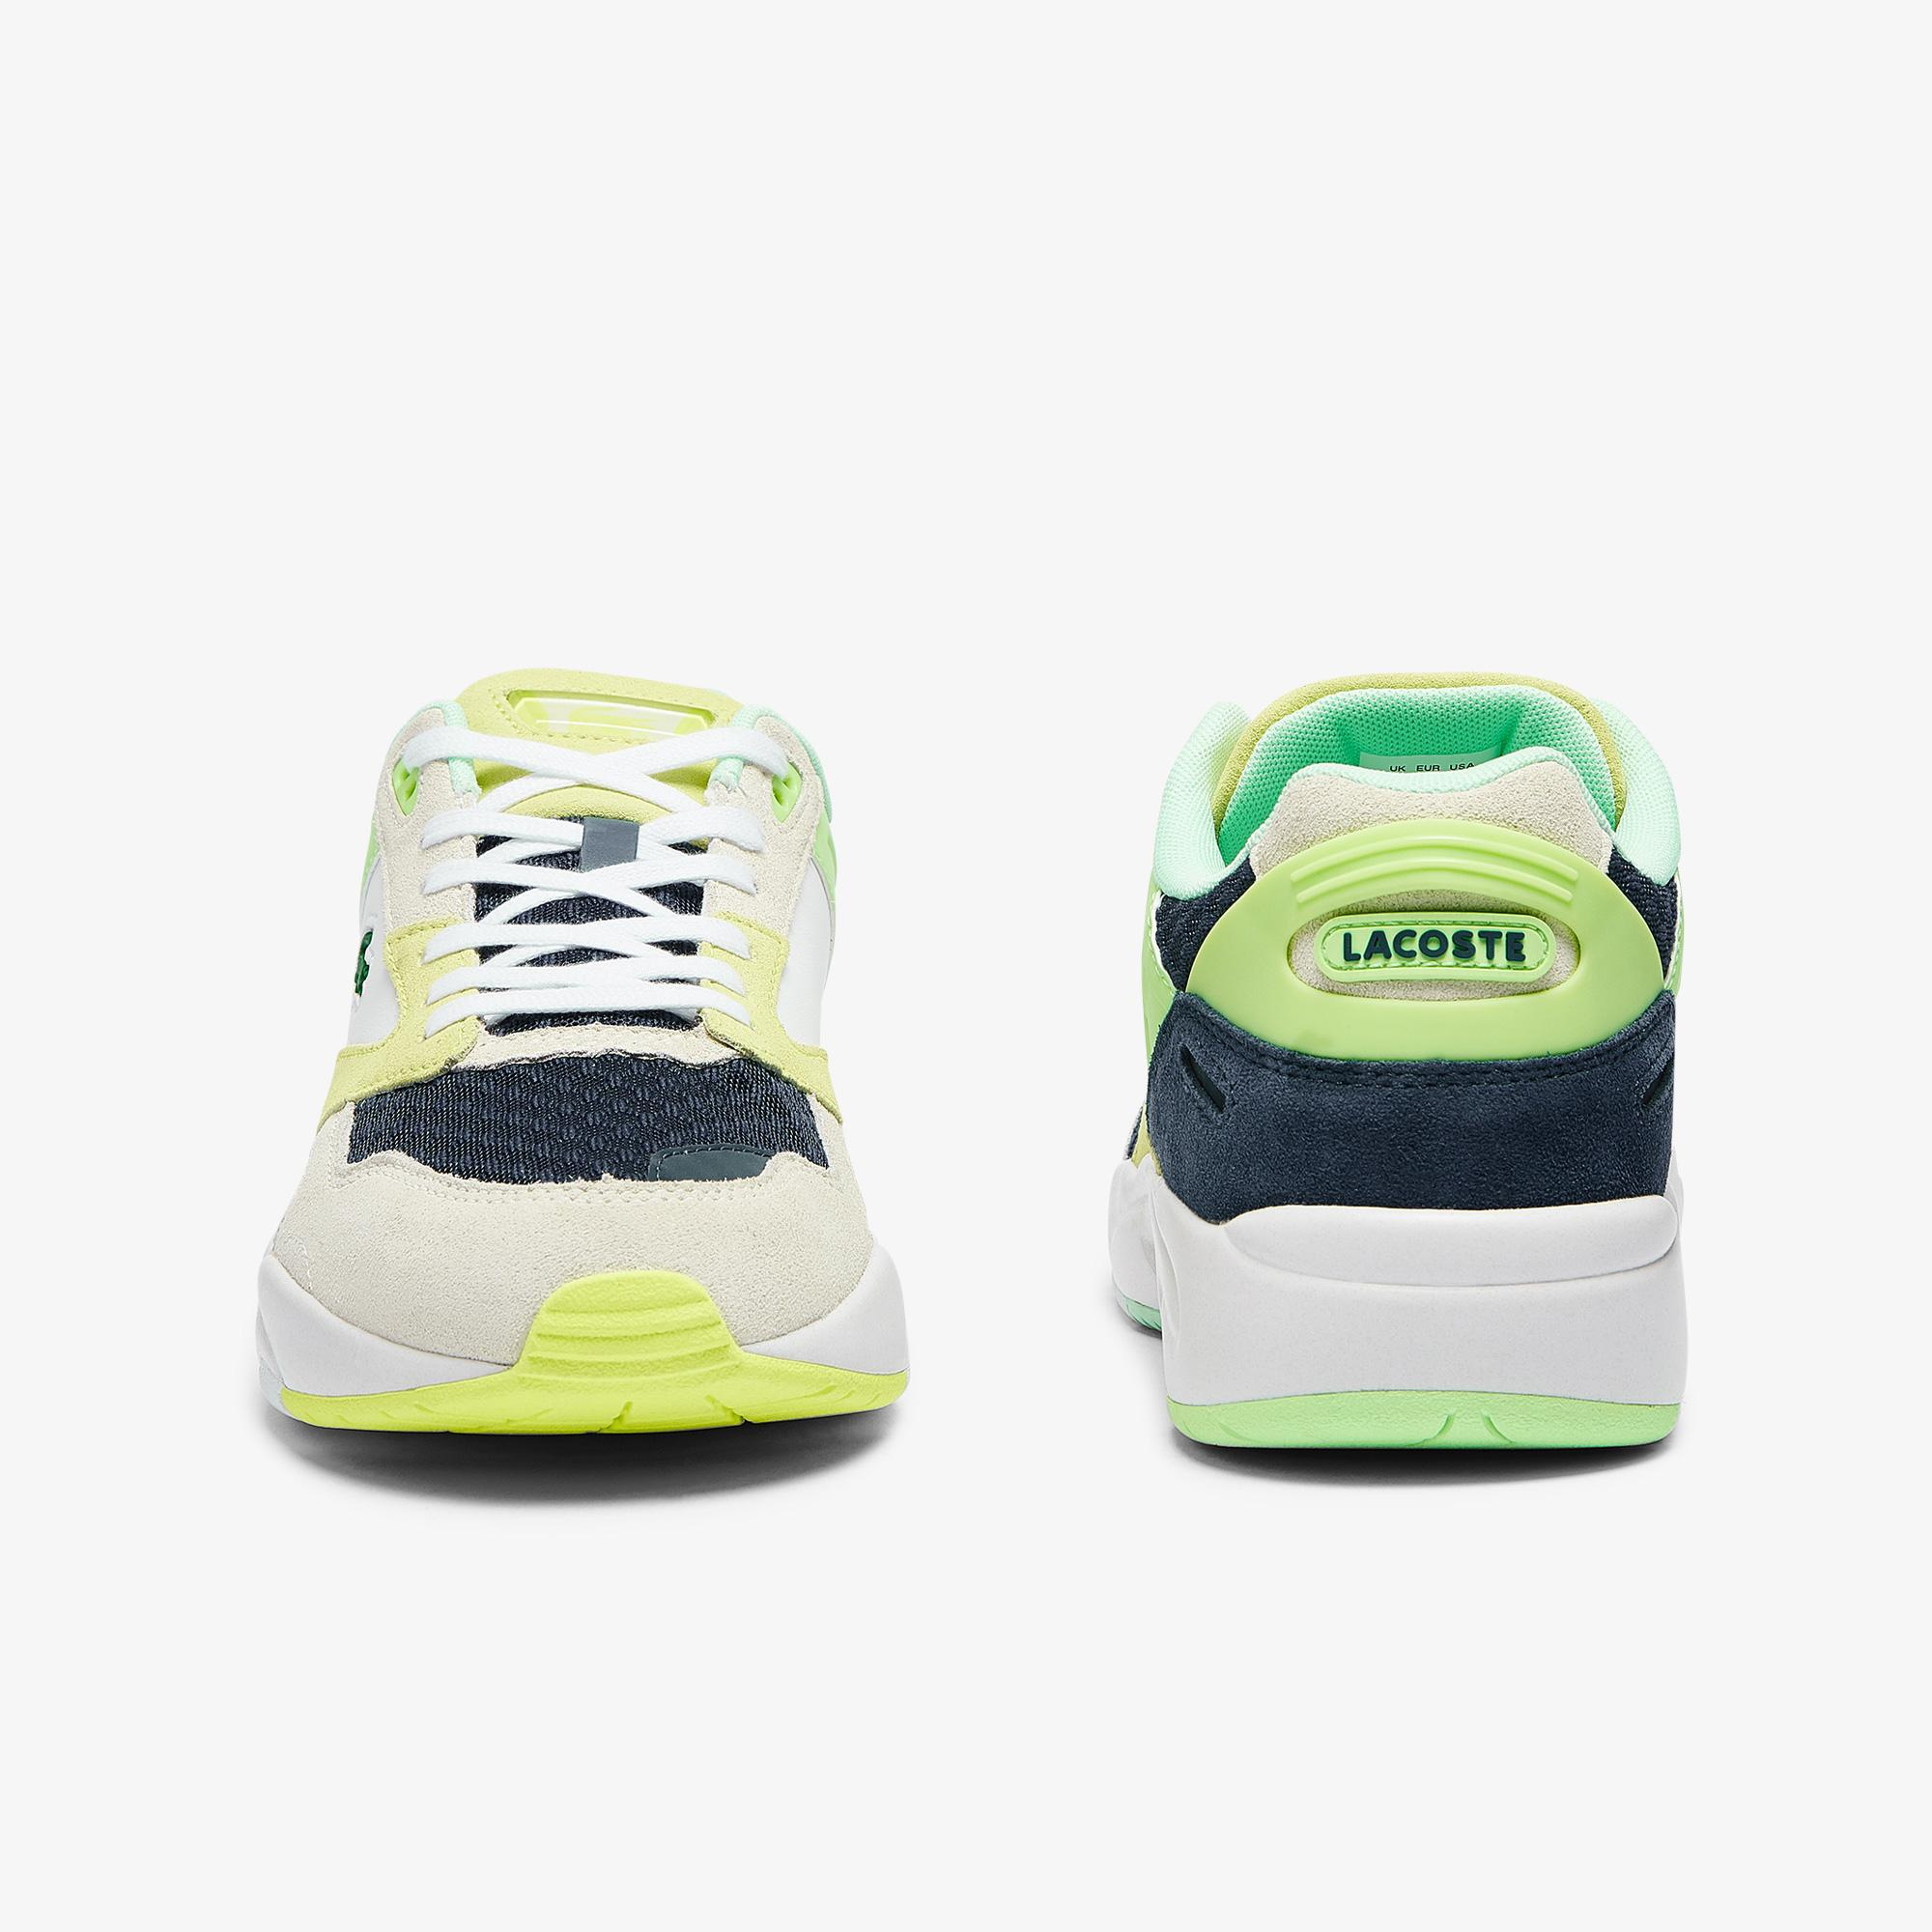 Lacoste Storm 96 Lo 0721 3 Sma Erkek Beyaz - Lacivert - Mavi Sneaker